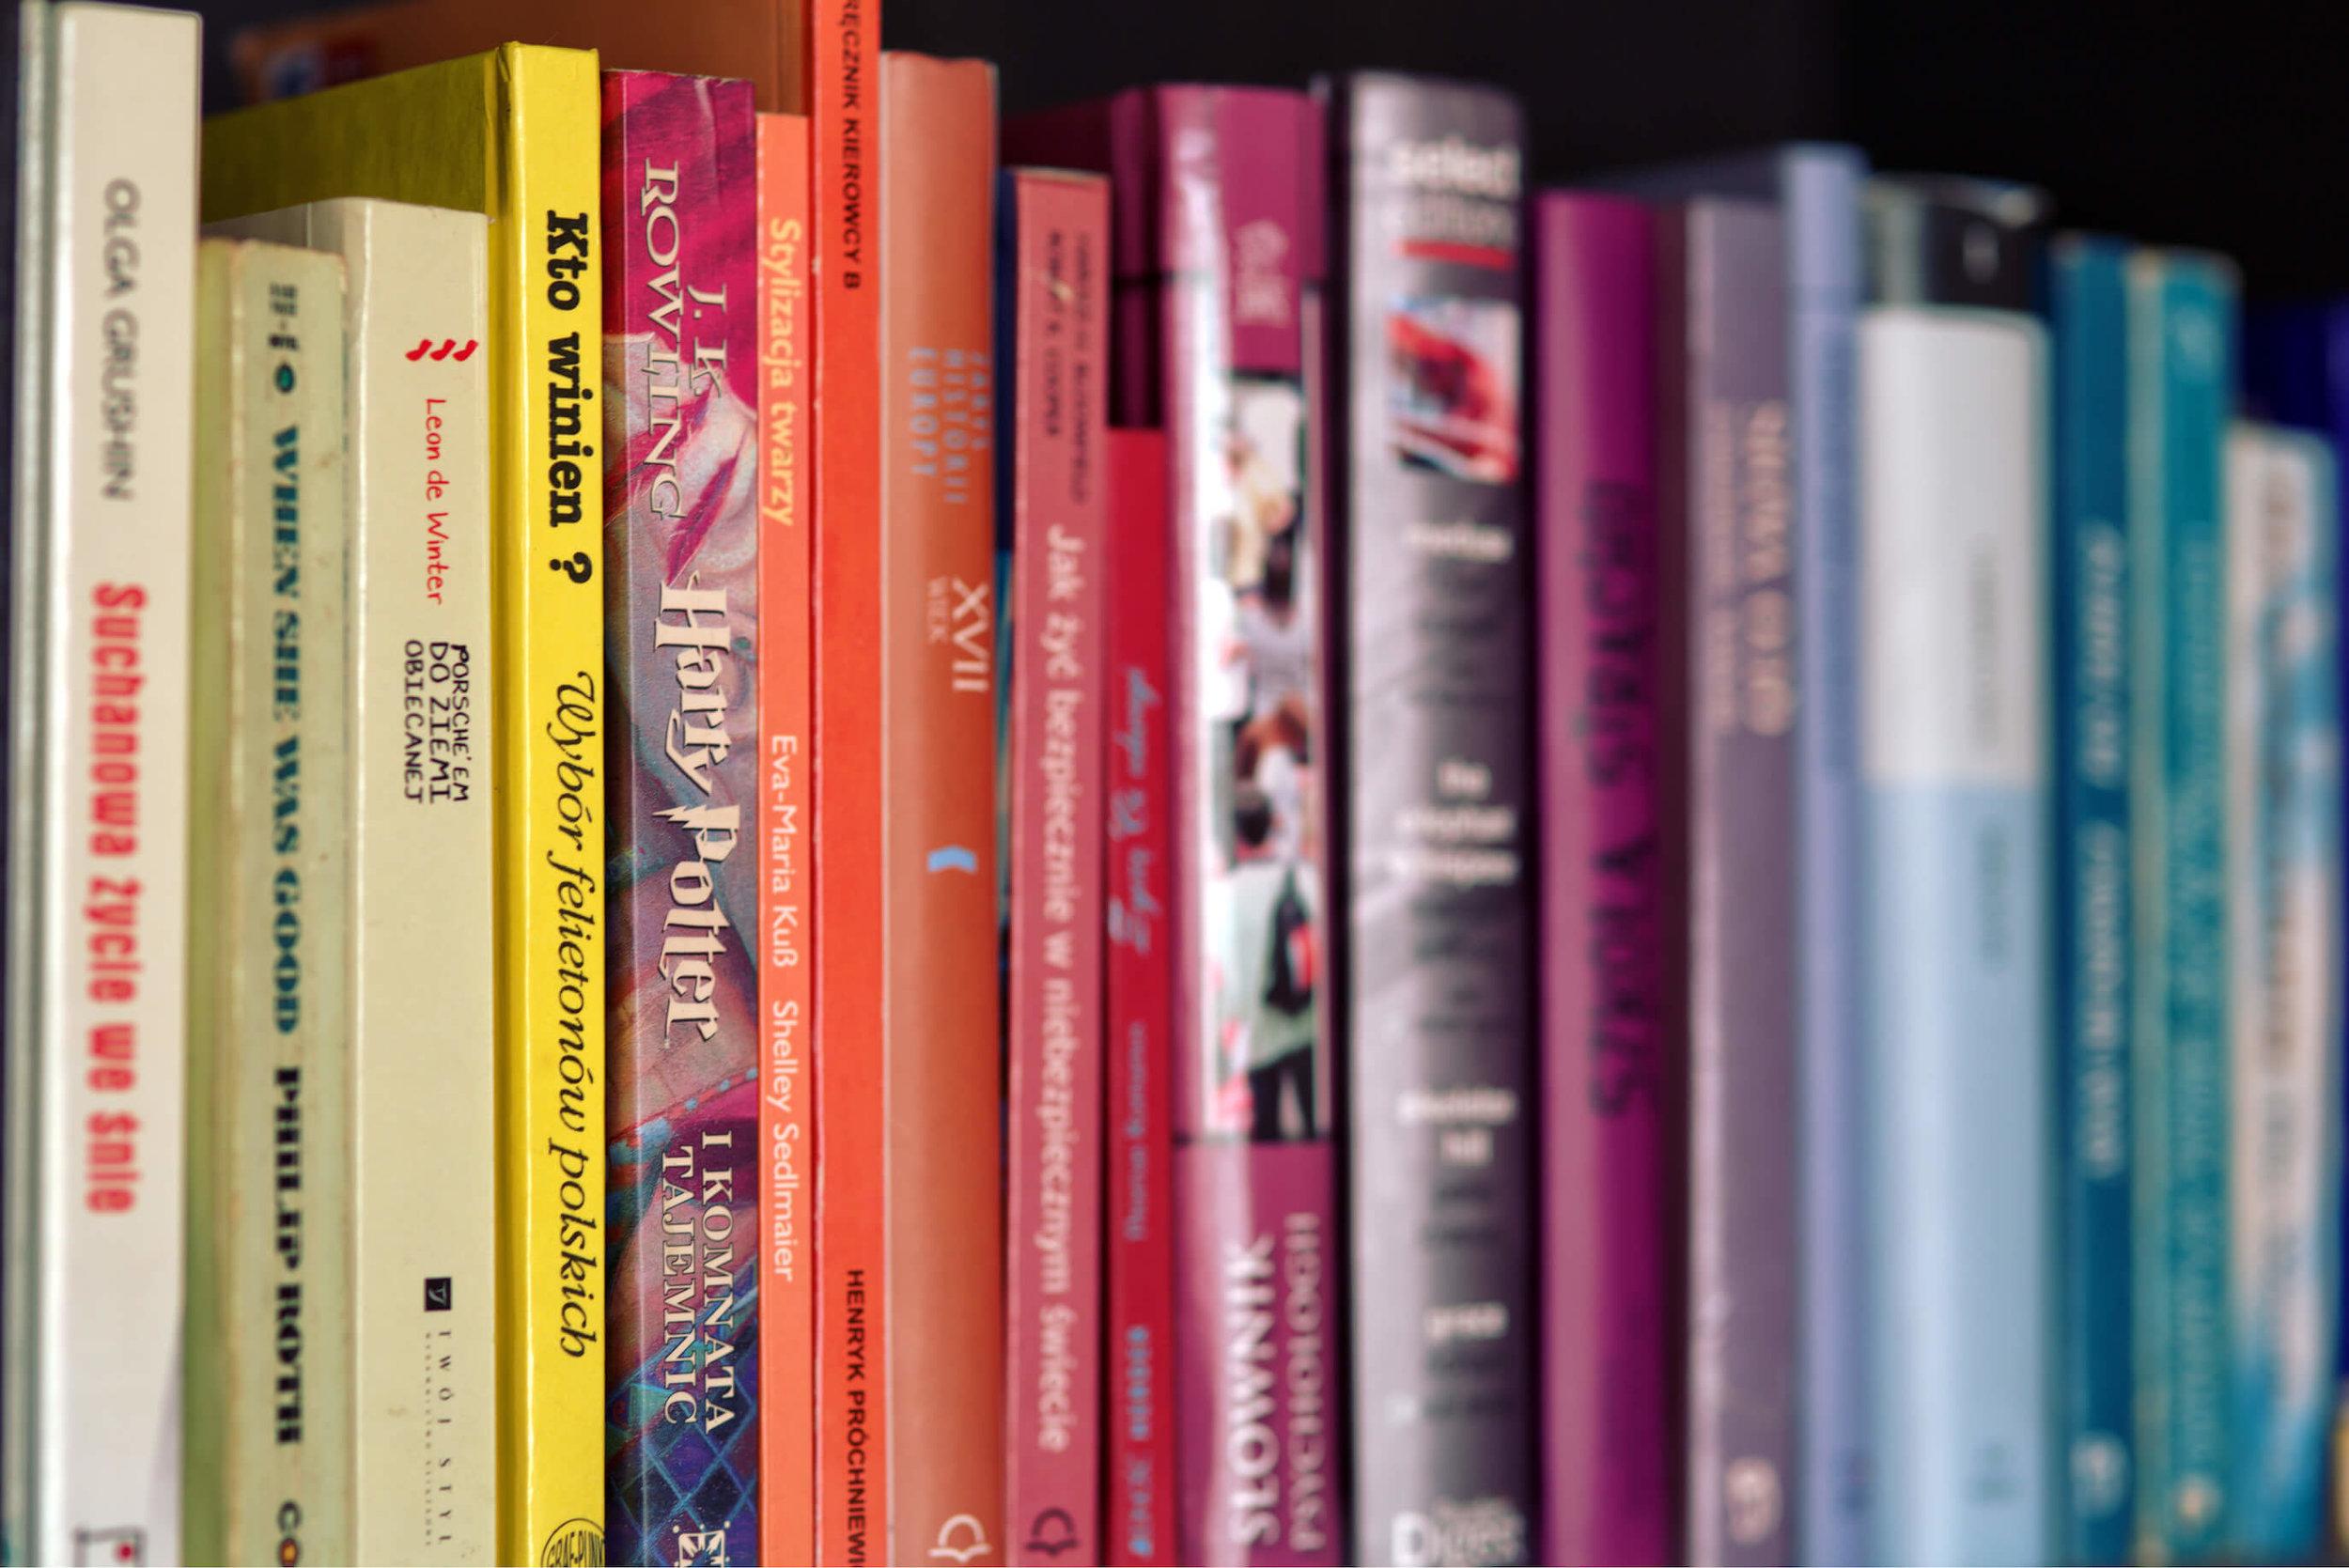 books-colorful-harry-potter-2.jpg